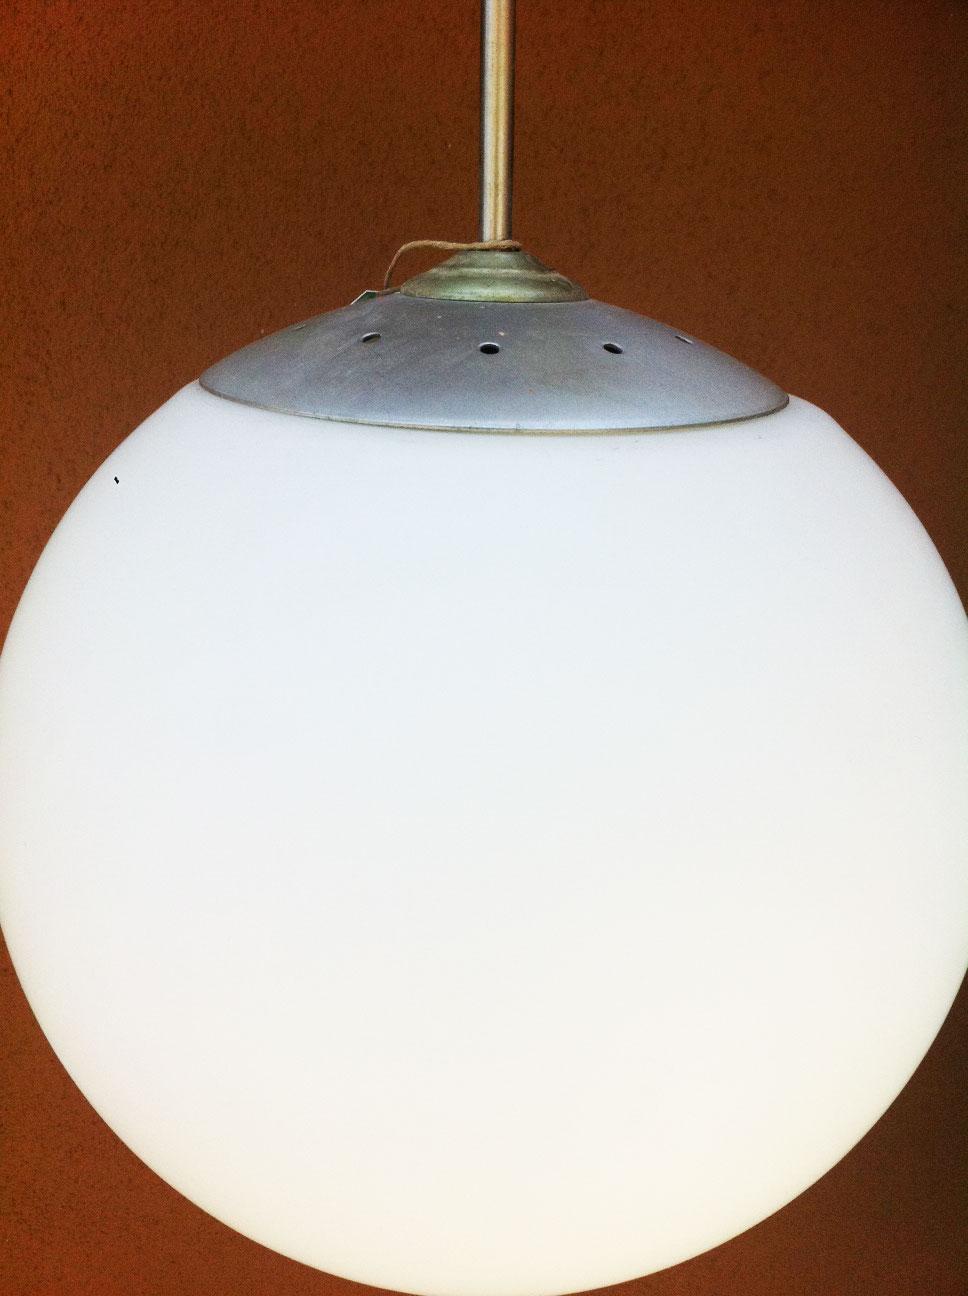 junk2funk: Mid-Century Modern Globe Pendant Light Fixture